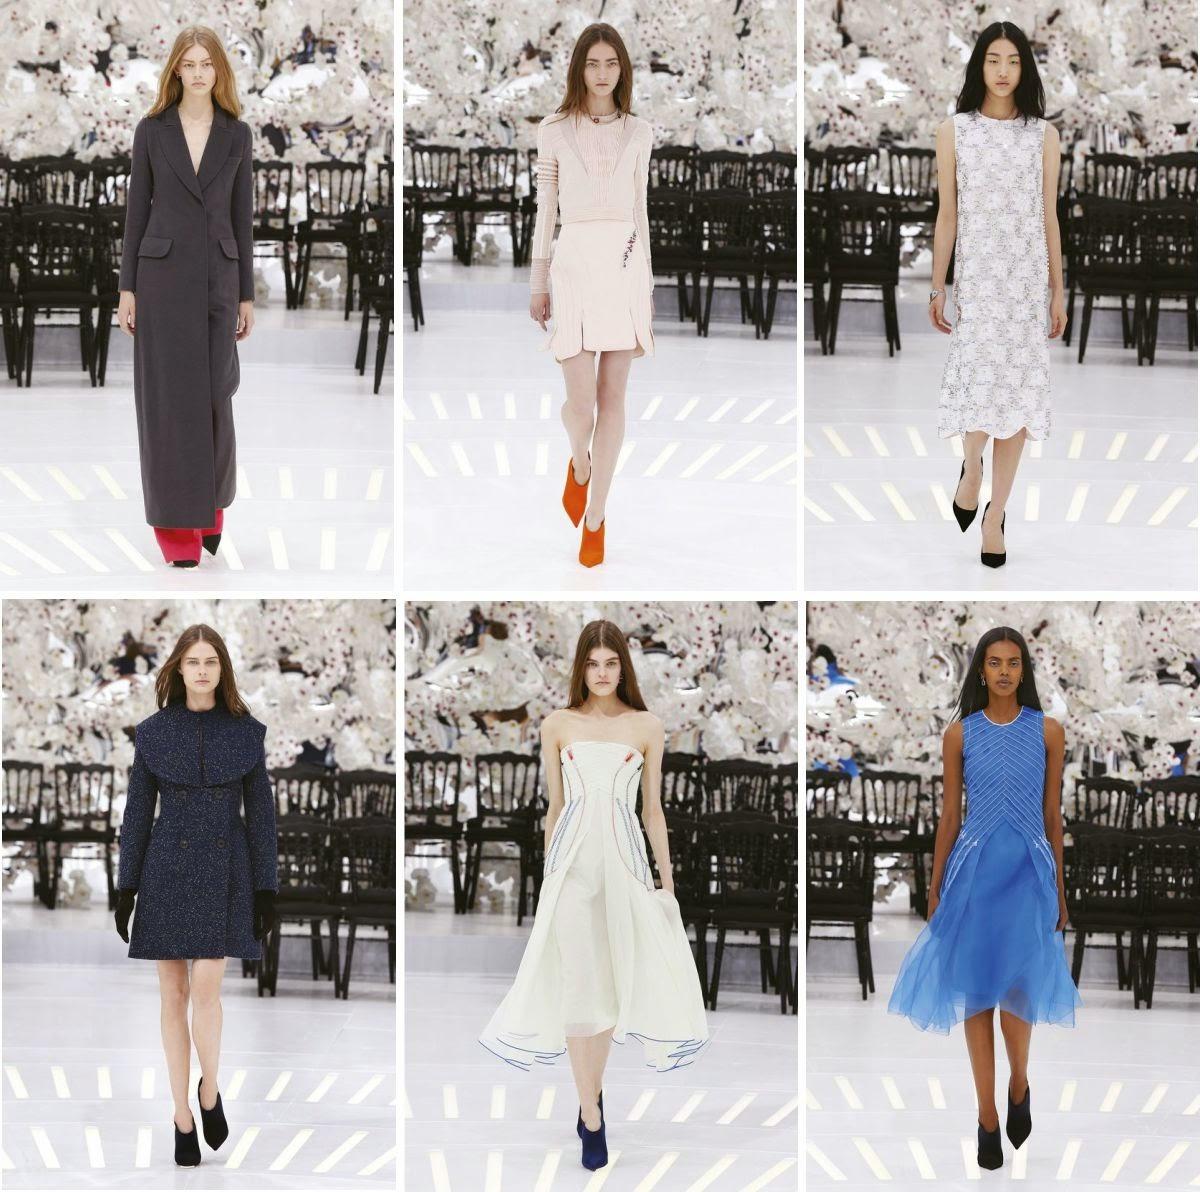 3b172524d912e Kolekcja Dior Haute Couture jesień zima 2014/15, fot. Dior.com